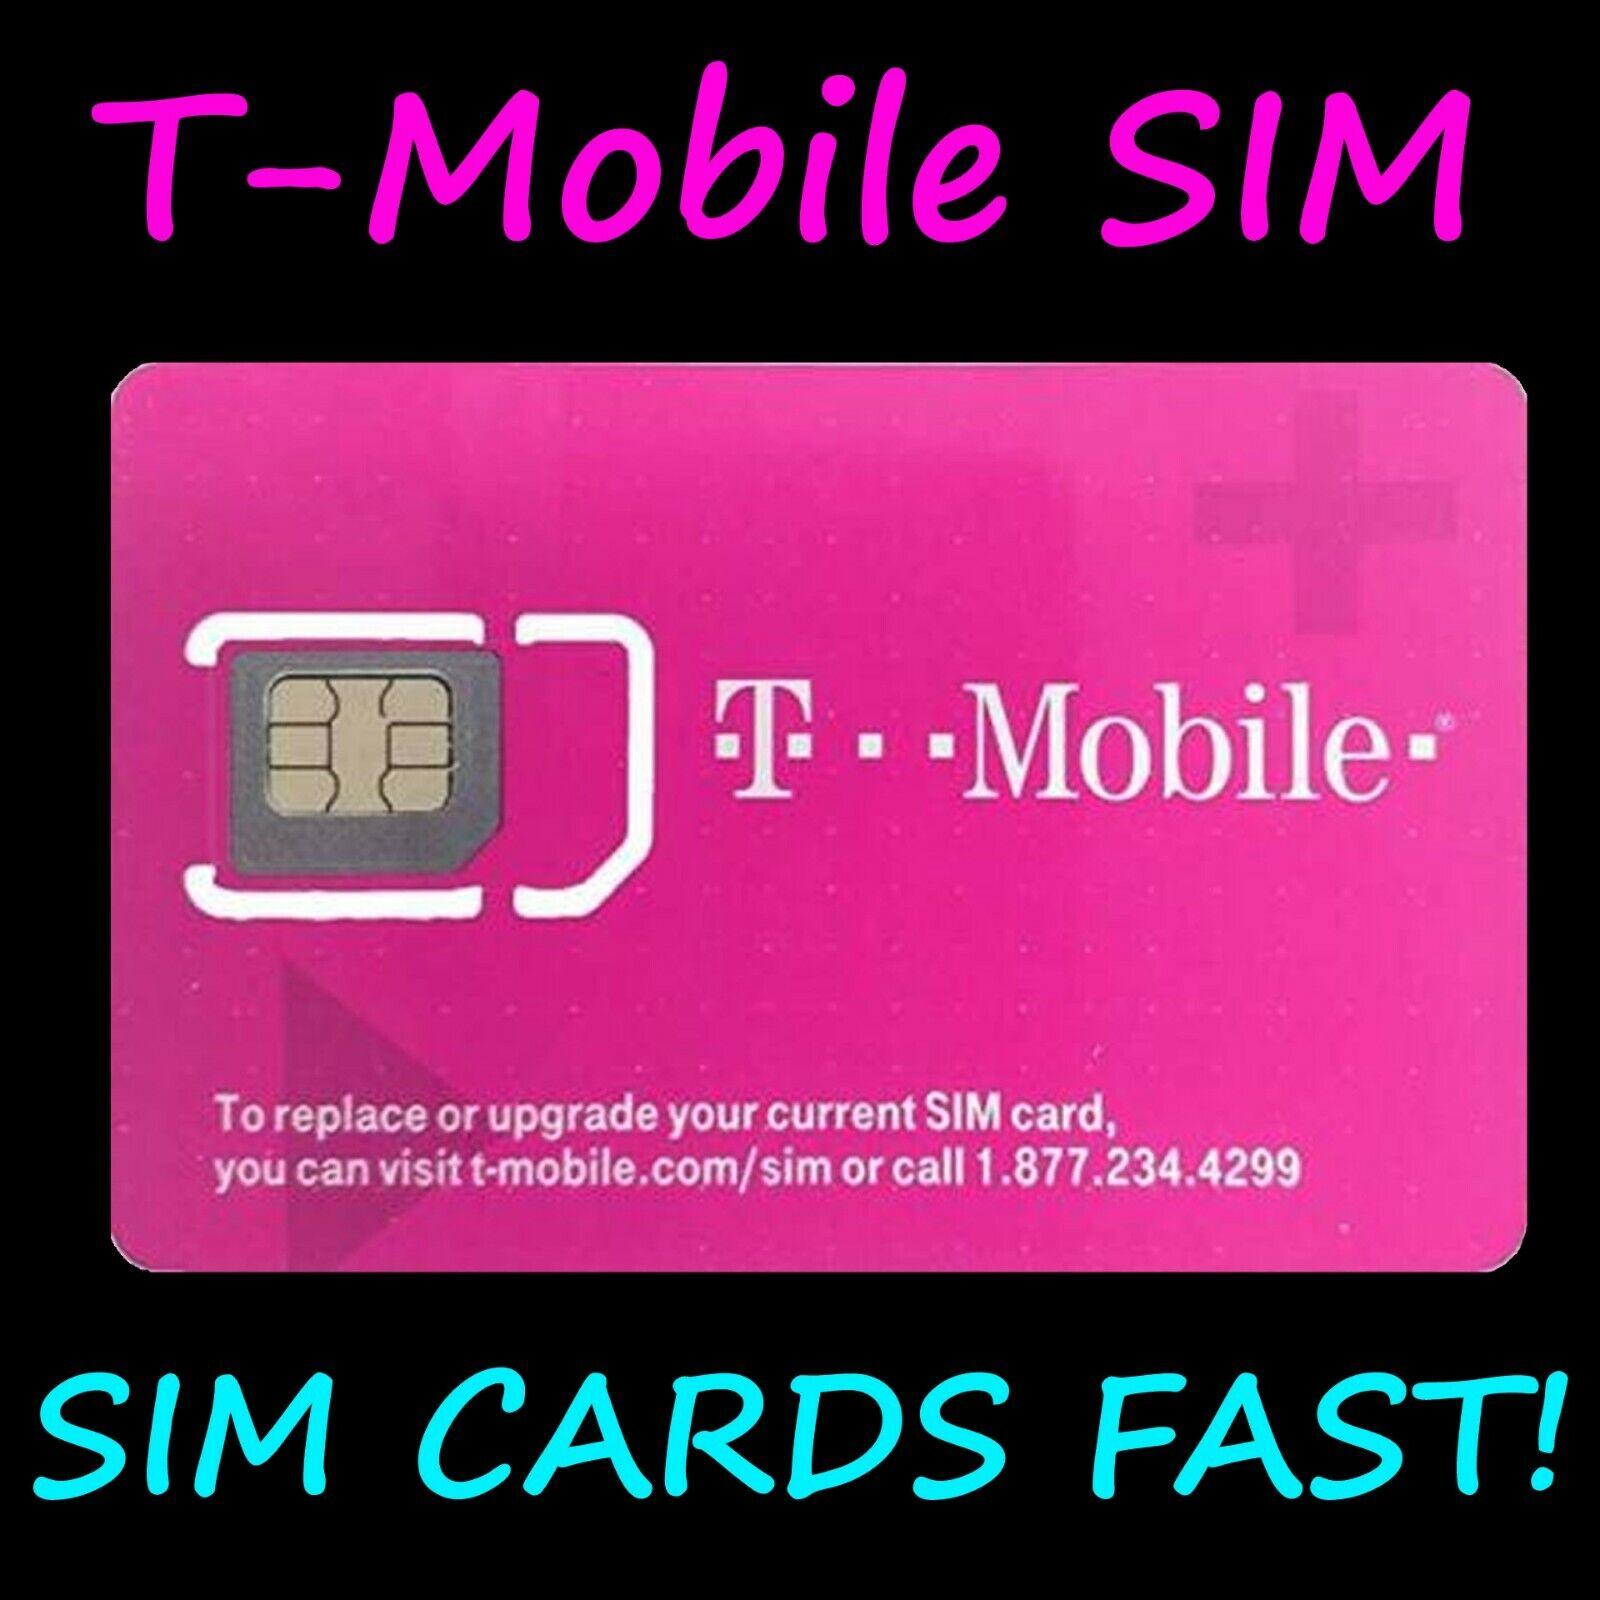 NEW TMobile 4G LTE SIM CARD Unactivated. 3 IN 1 TRIPLE CUT.